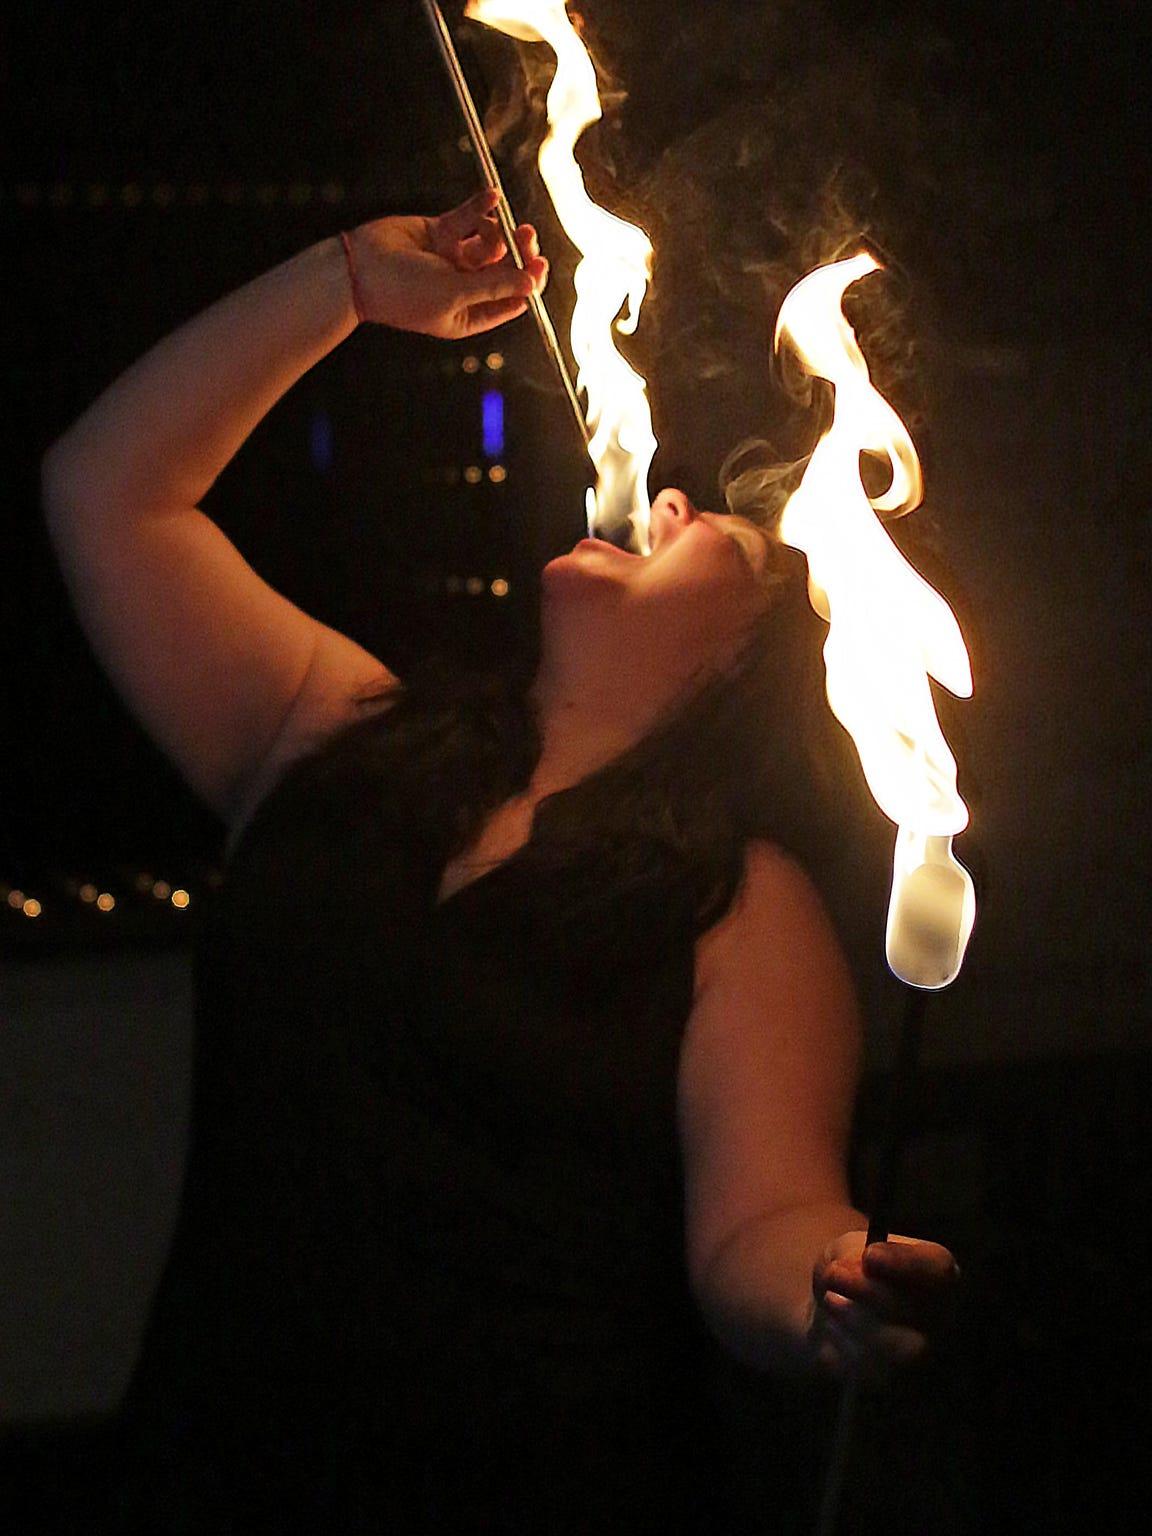 Valerie Ringwell of Sheboygan, swallows a fire baton